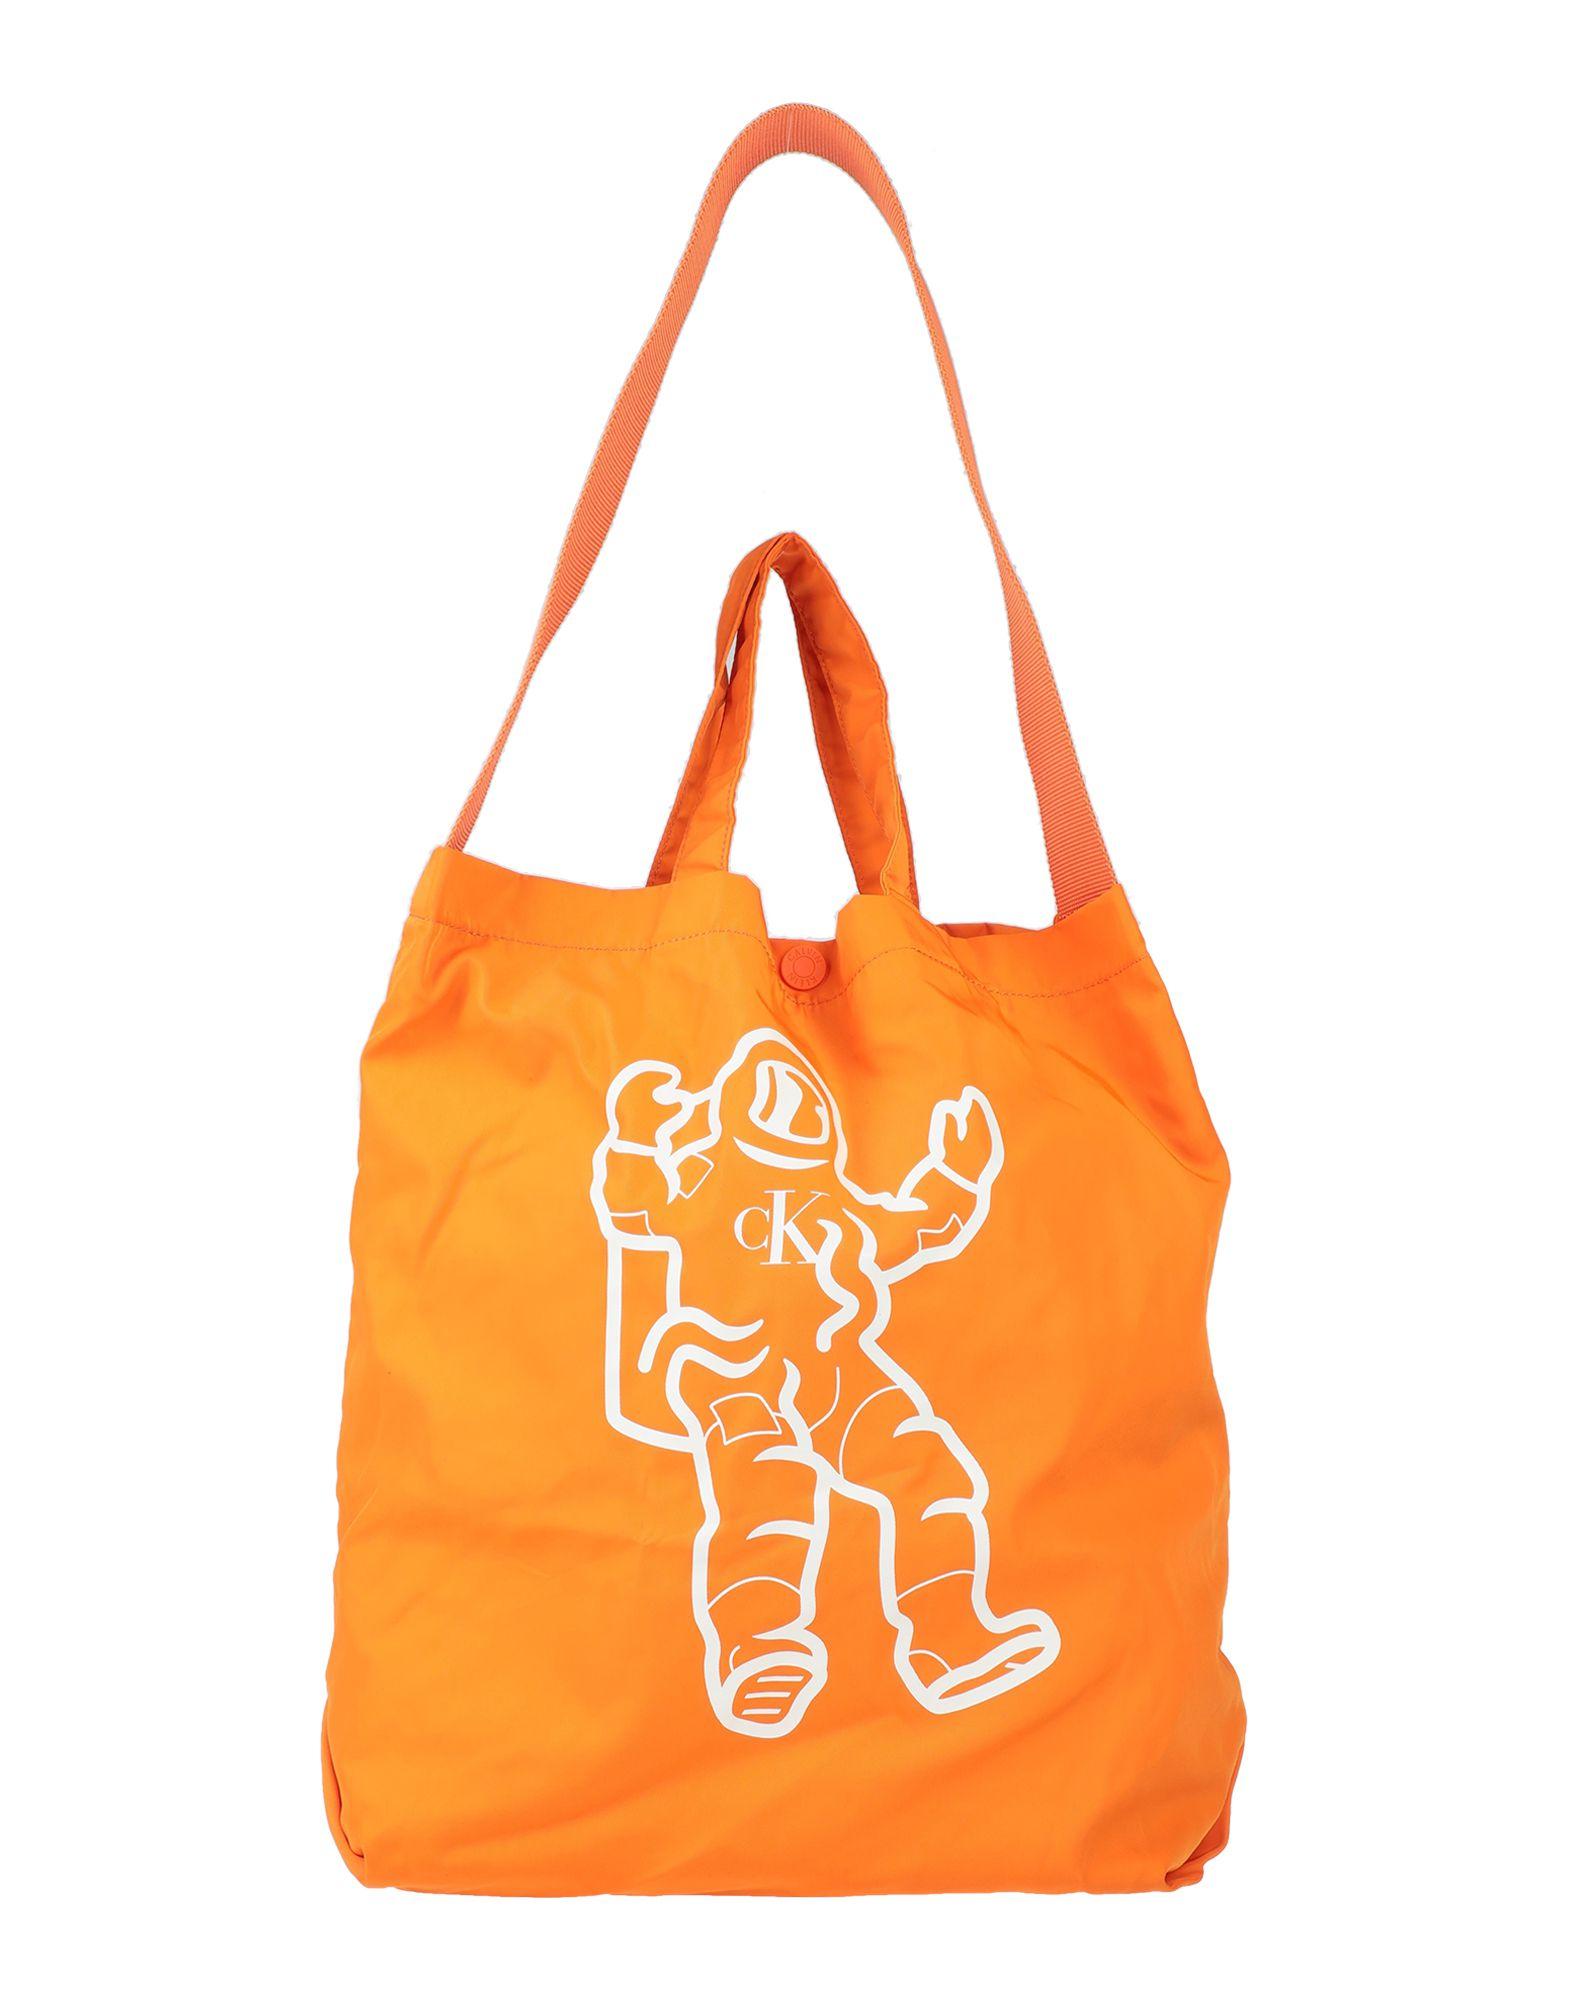 CALVIN KLEIN JEANS Shoulder bags - Item 45527333